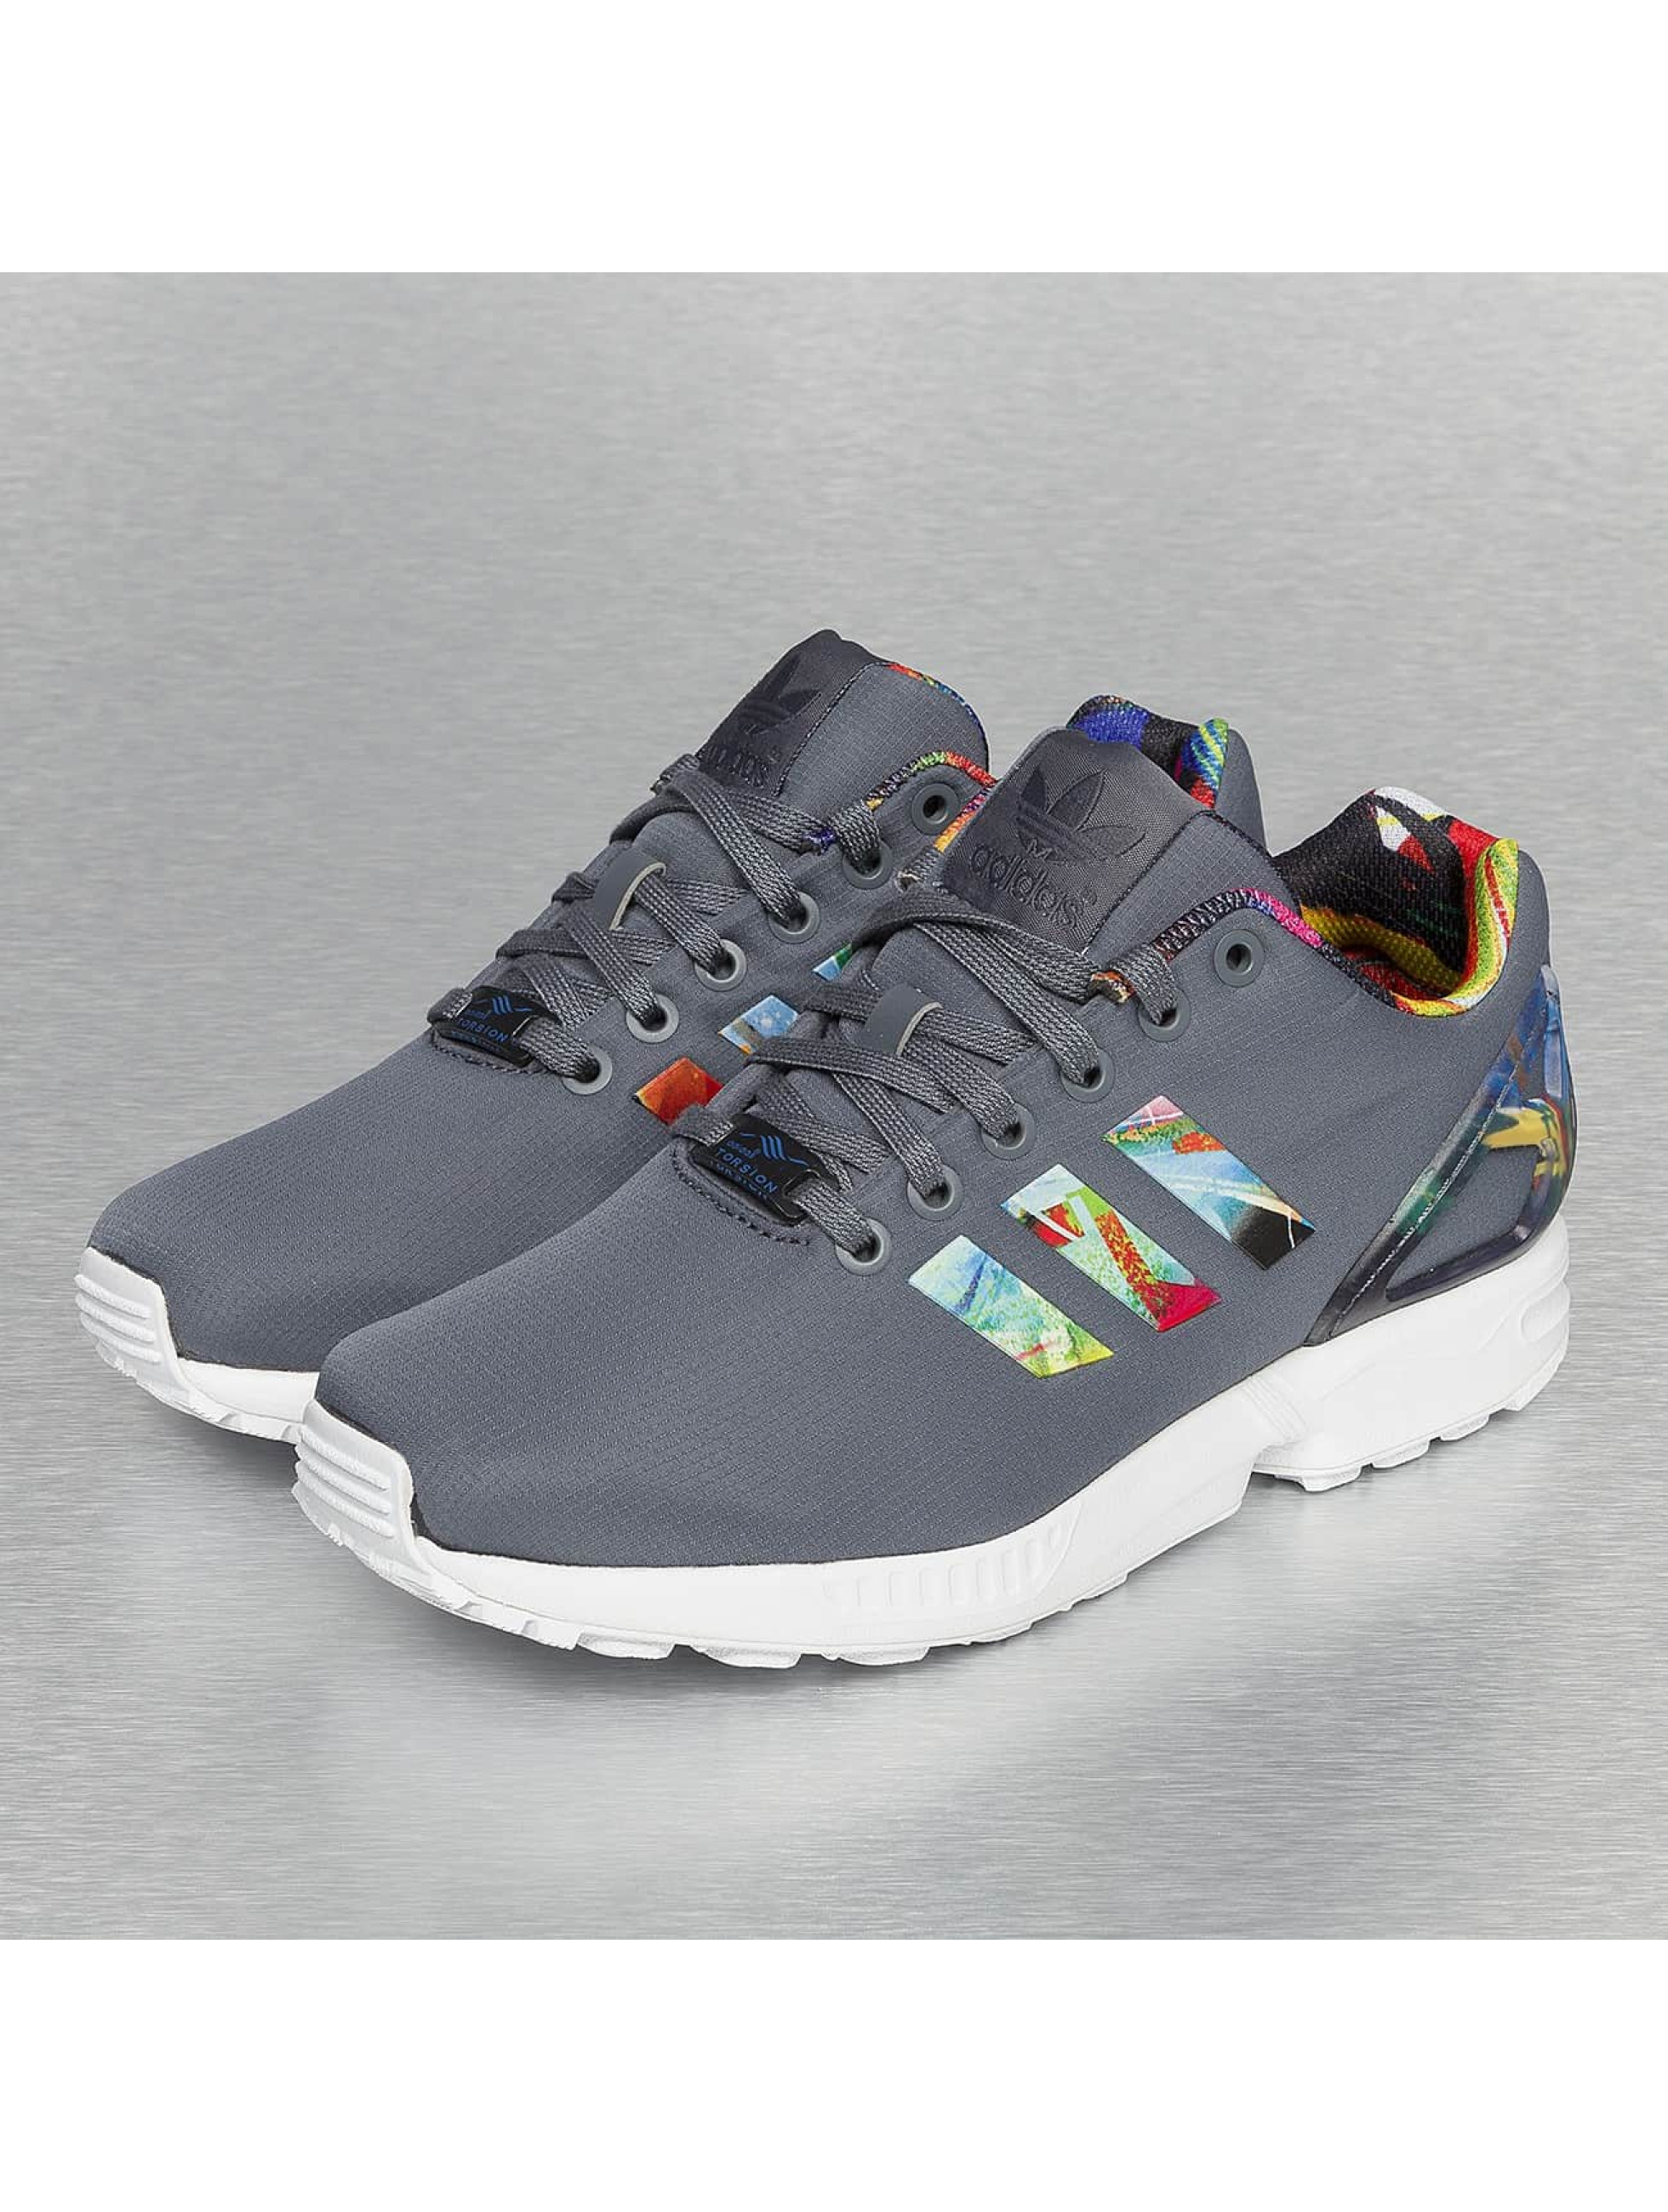 adidas zx flux bunt damen adidas sneaker zx 750 adidas. Black Bedroom Furniture Sets. Home Design Ideas